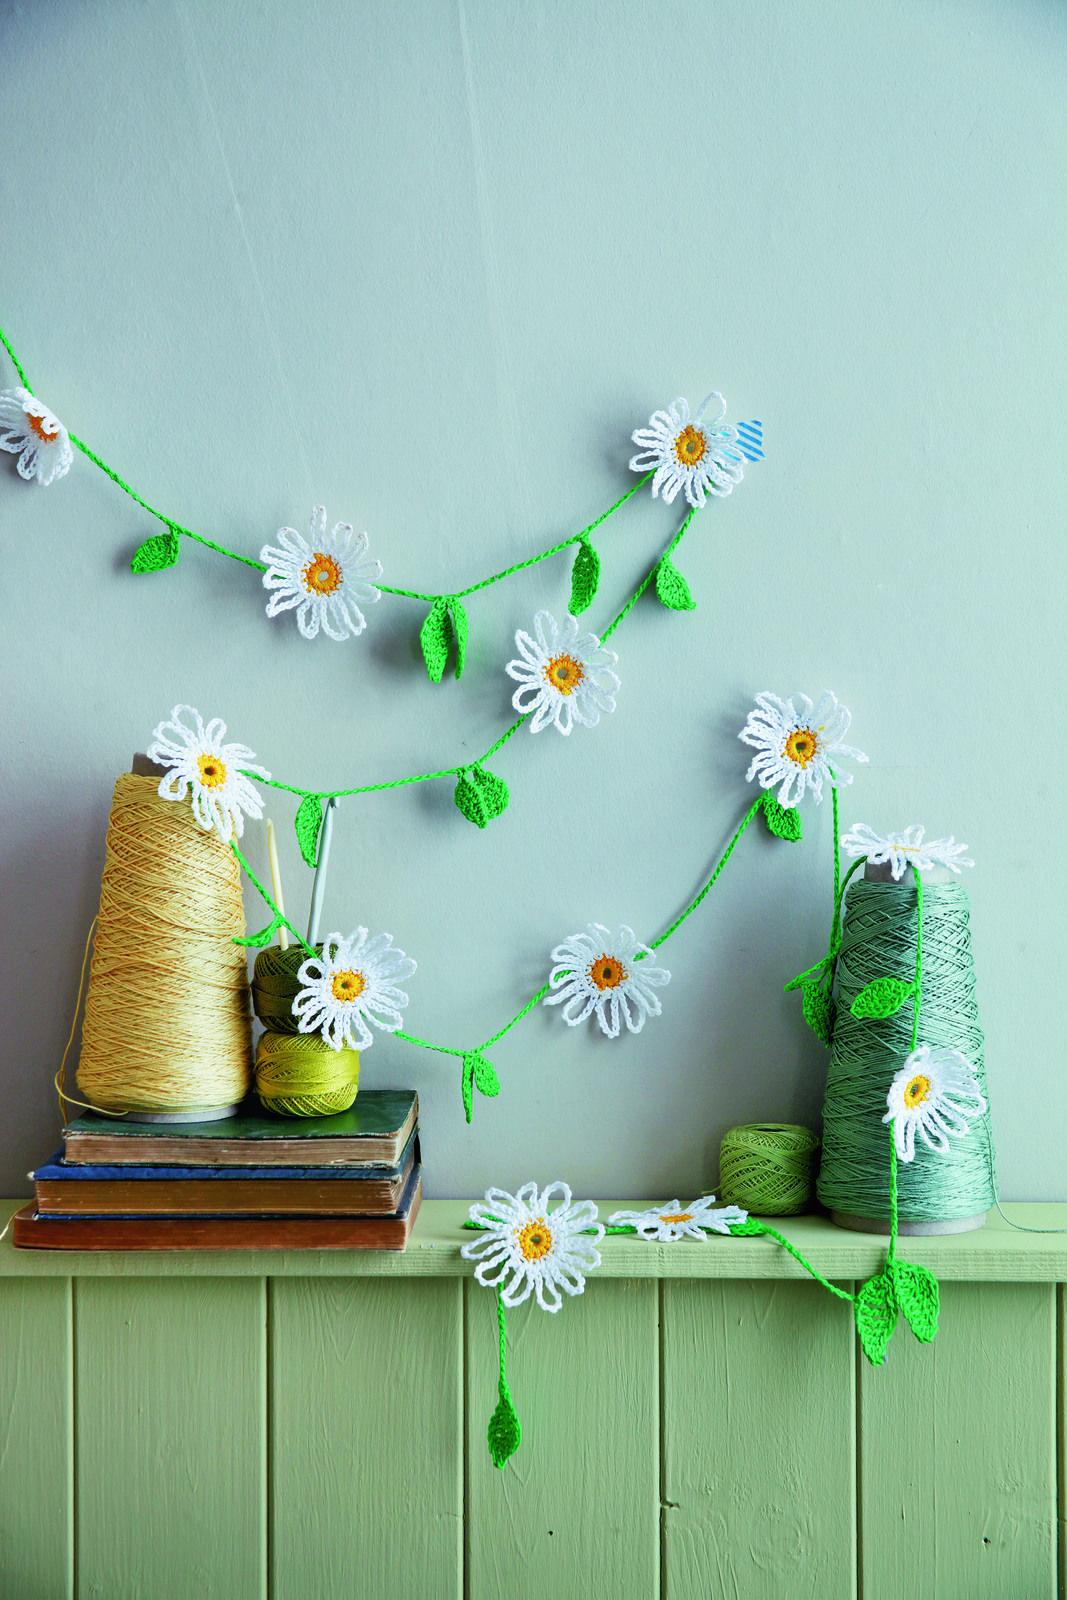 Daisy Chain from Hook Yarn & Crochet Ros Badger Quadrille 2013